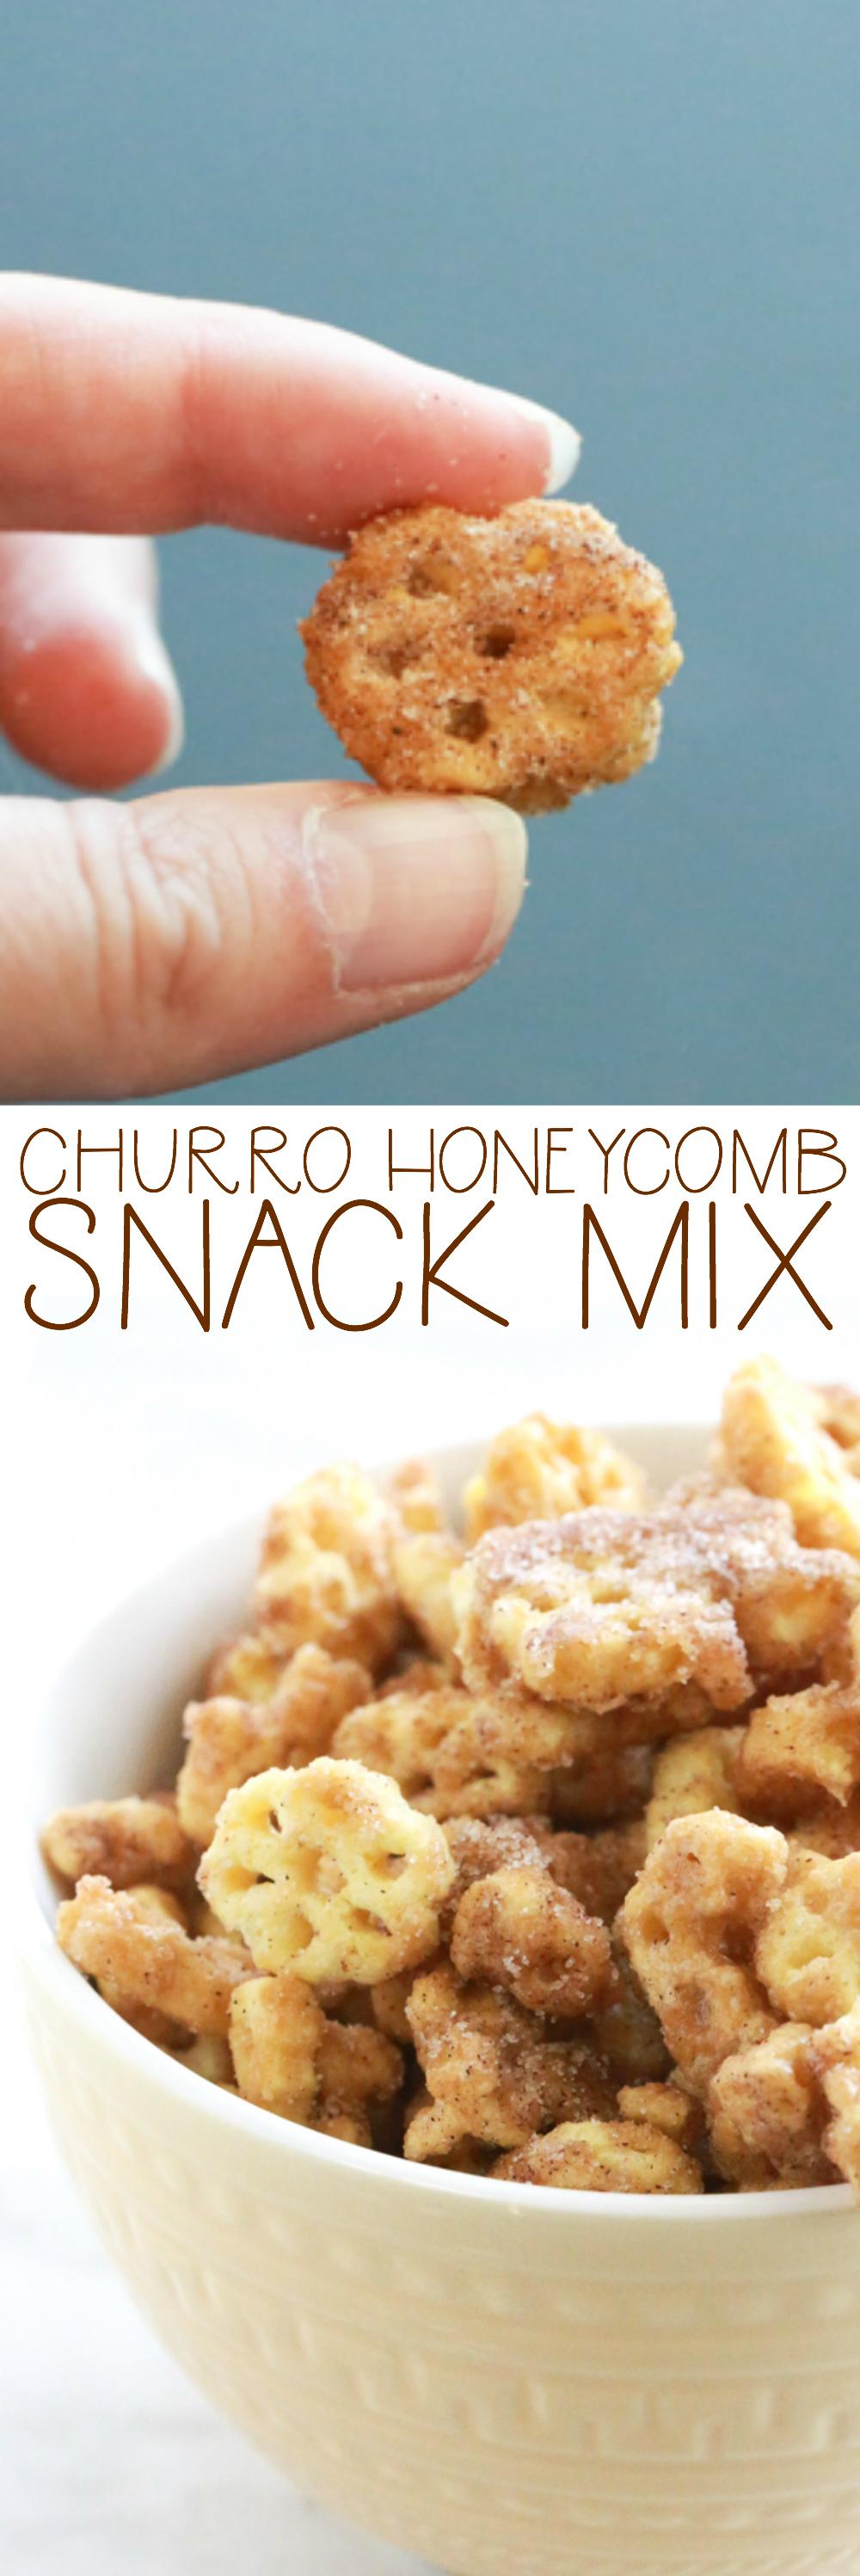 churro honeycomb snack mix